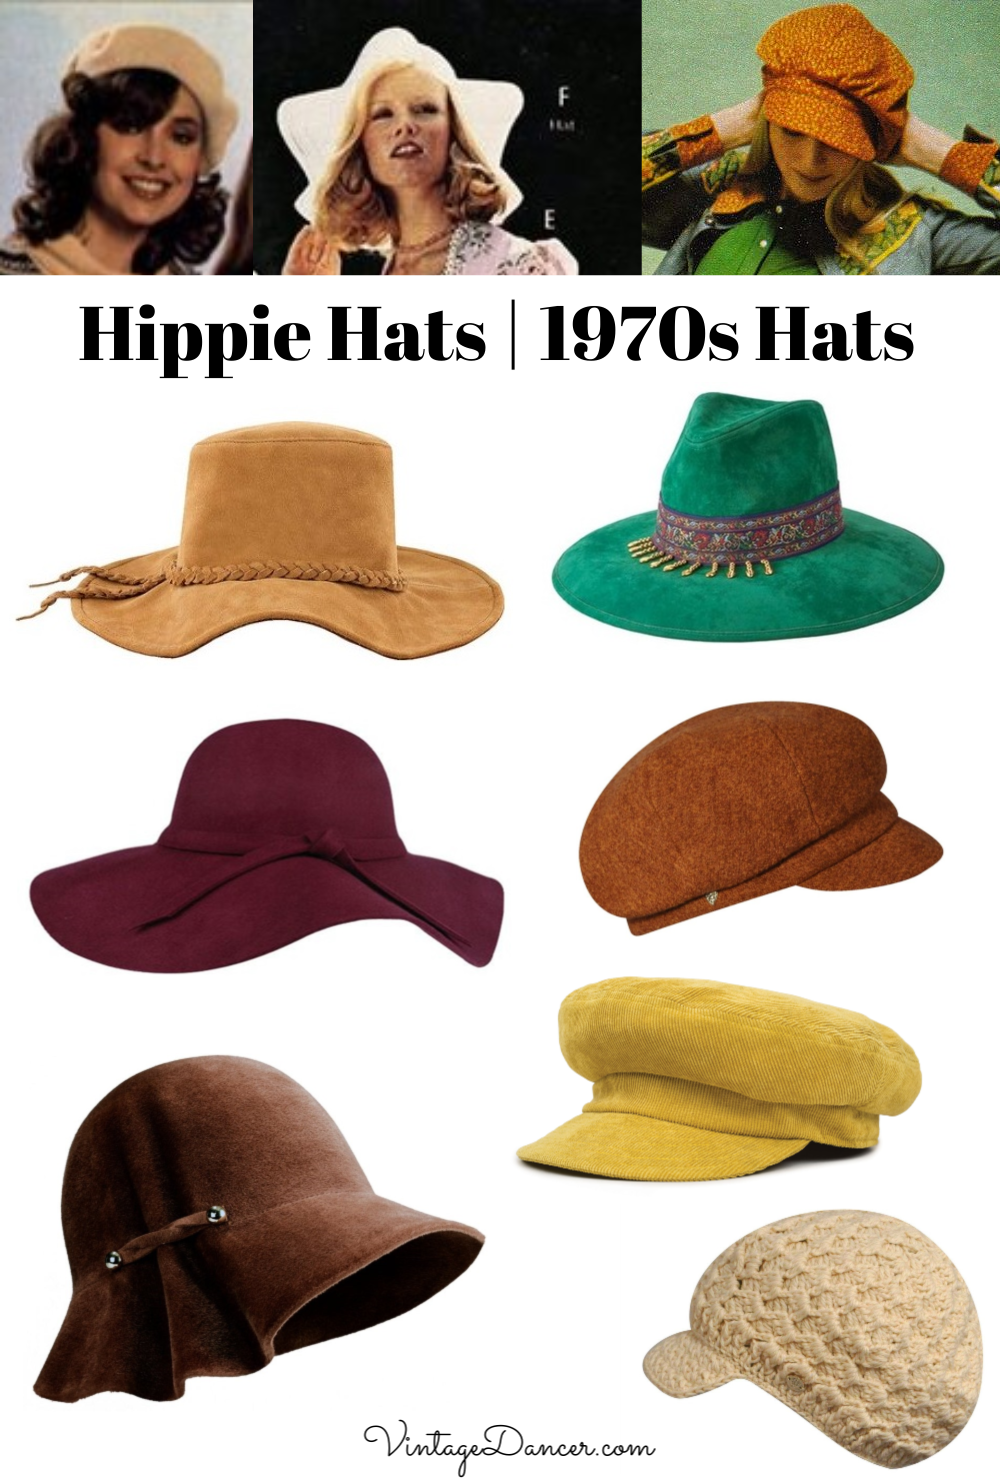 Hippie Hats 70s Hats 1970s Hats Boho Hats Disco Hats For Women At Vintagedancer 70s Fashion Hippie Hippie Hat 70s Hats